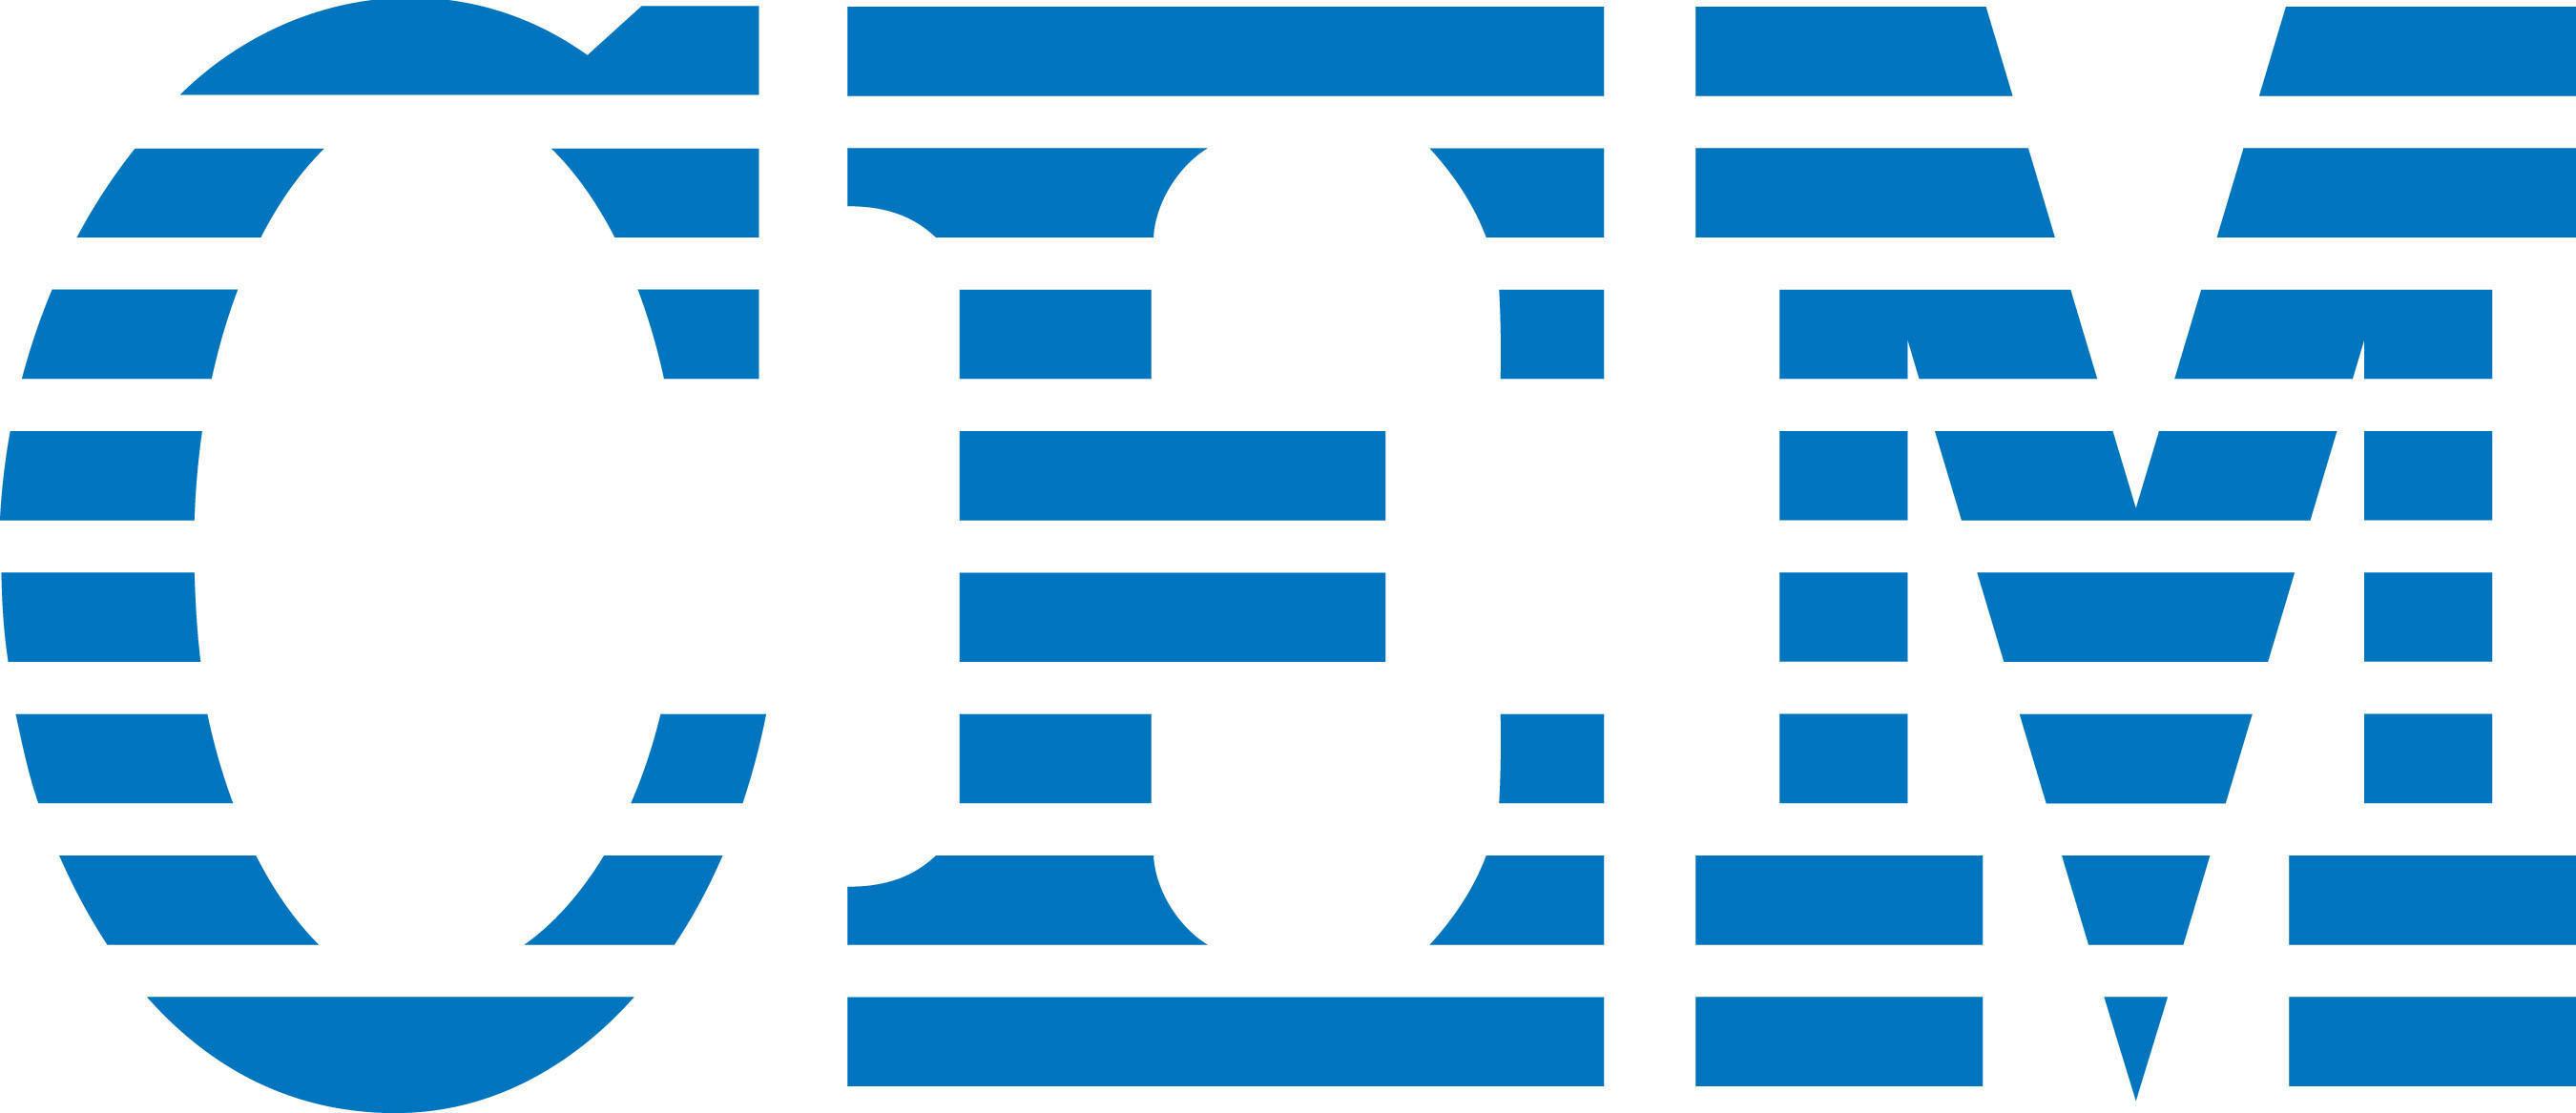 CEM Corporation logo.